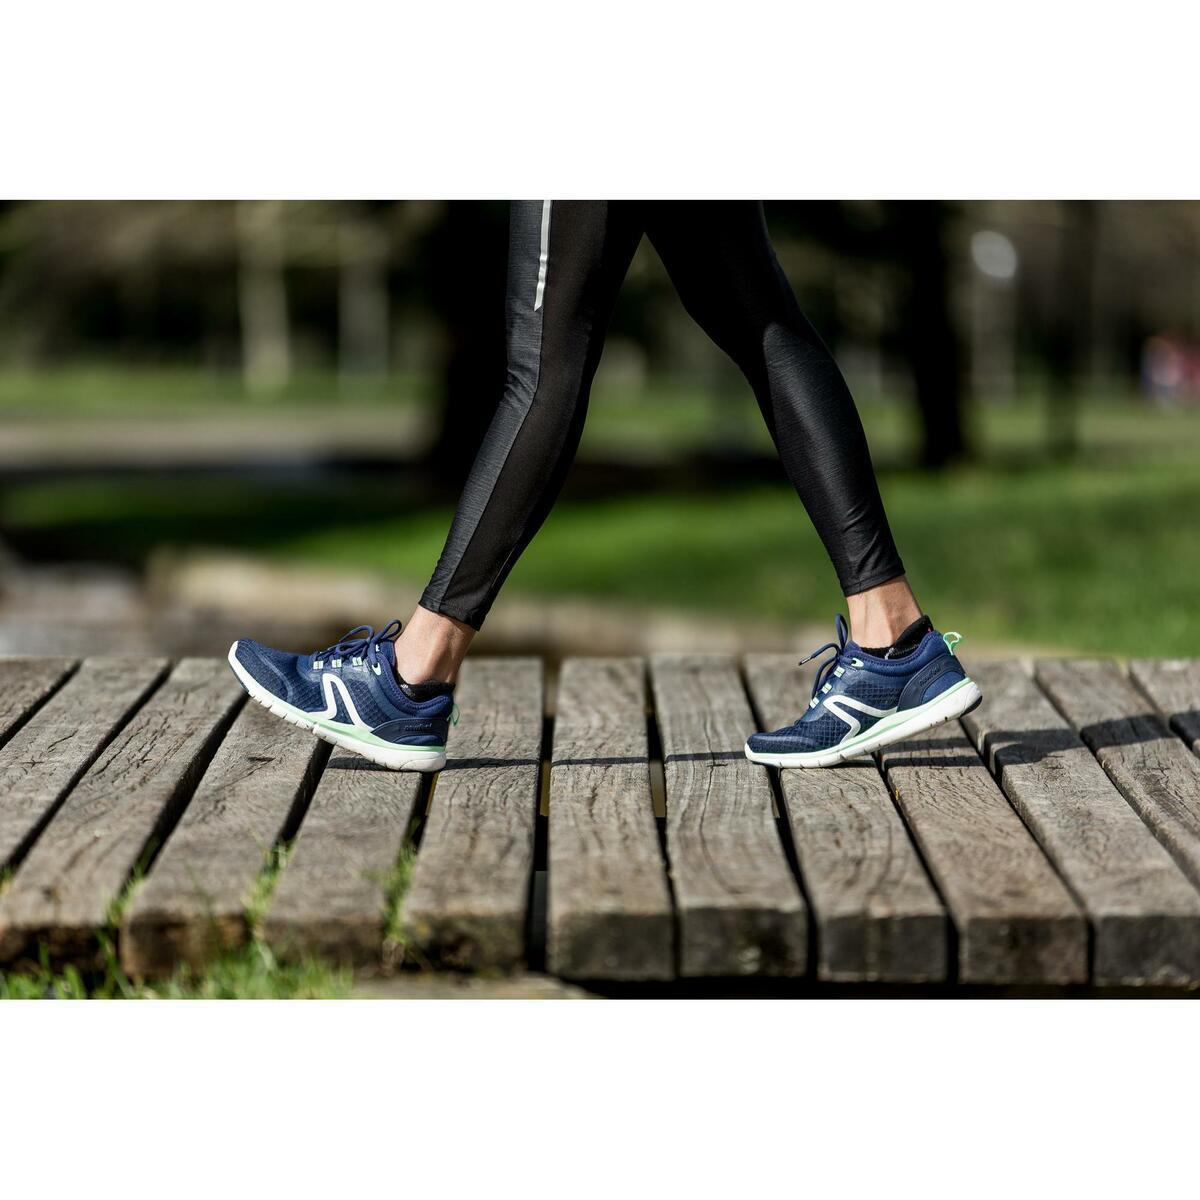 Bild 2 von Walkingschuhe Soft 540 Mesh Damen marineblau/grün